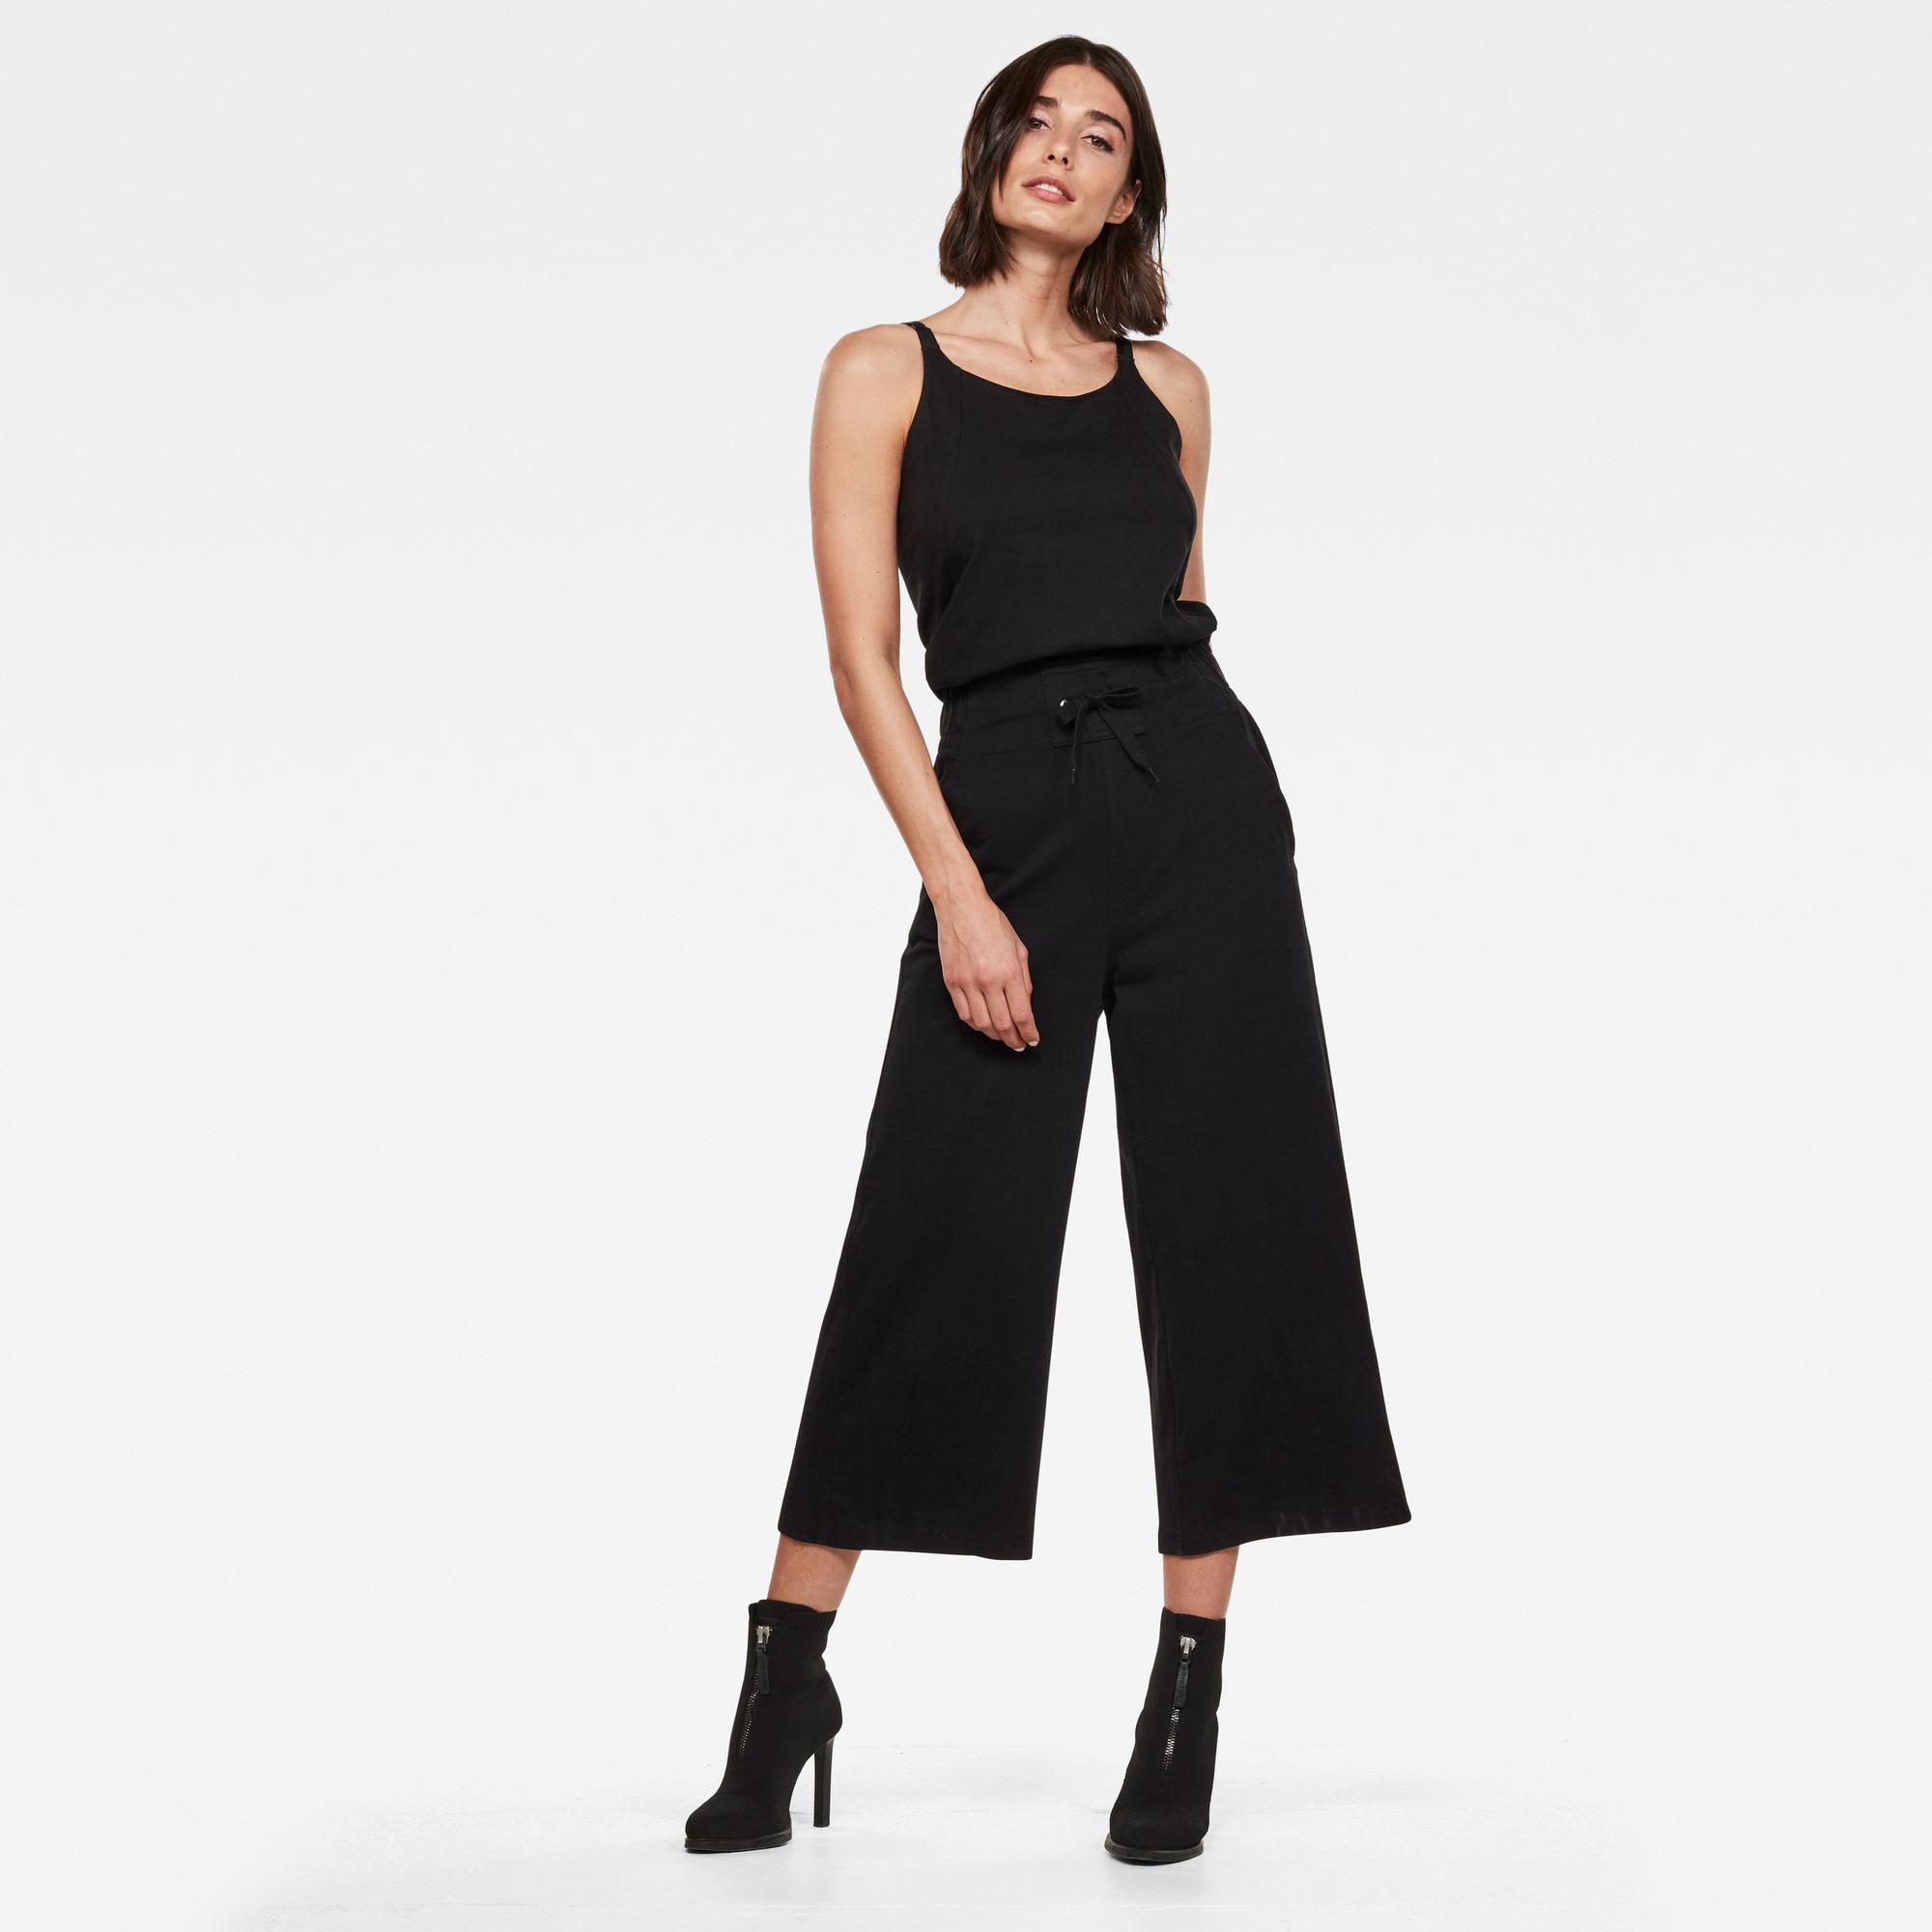 A model wears the black jumpsuit